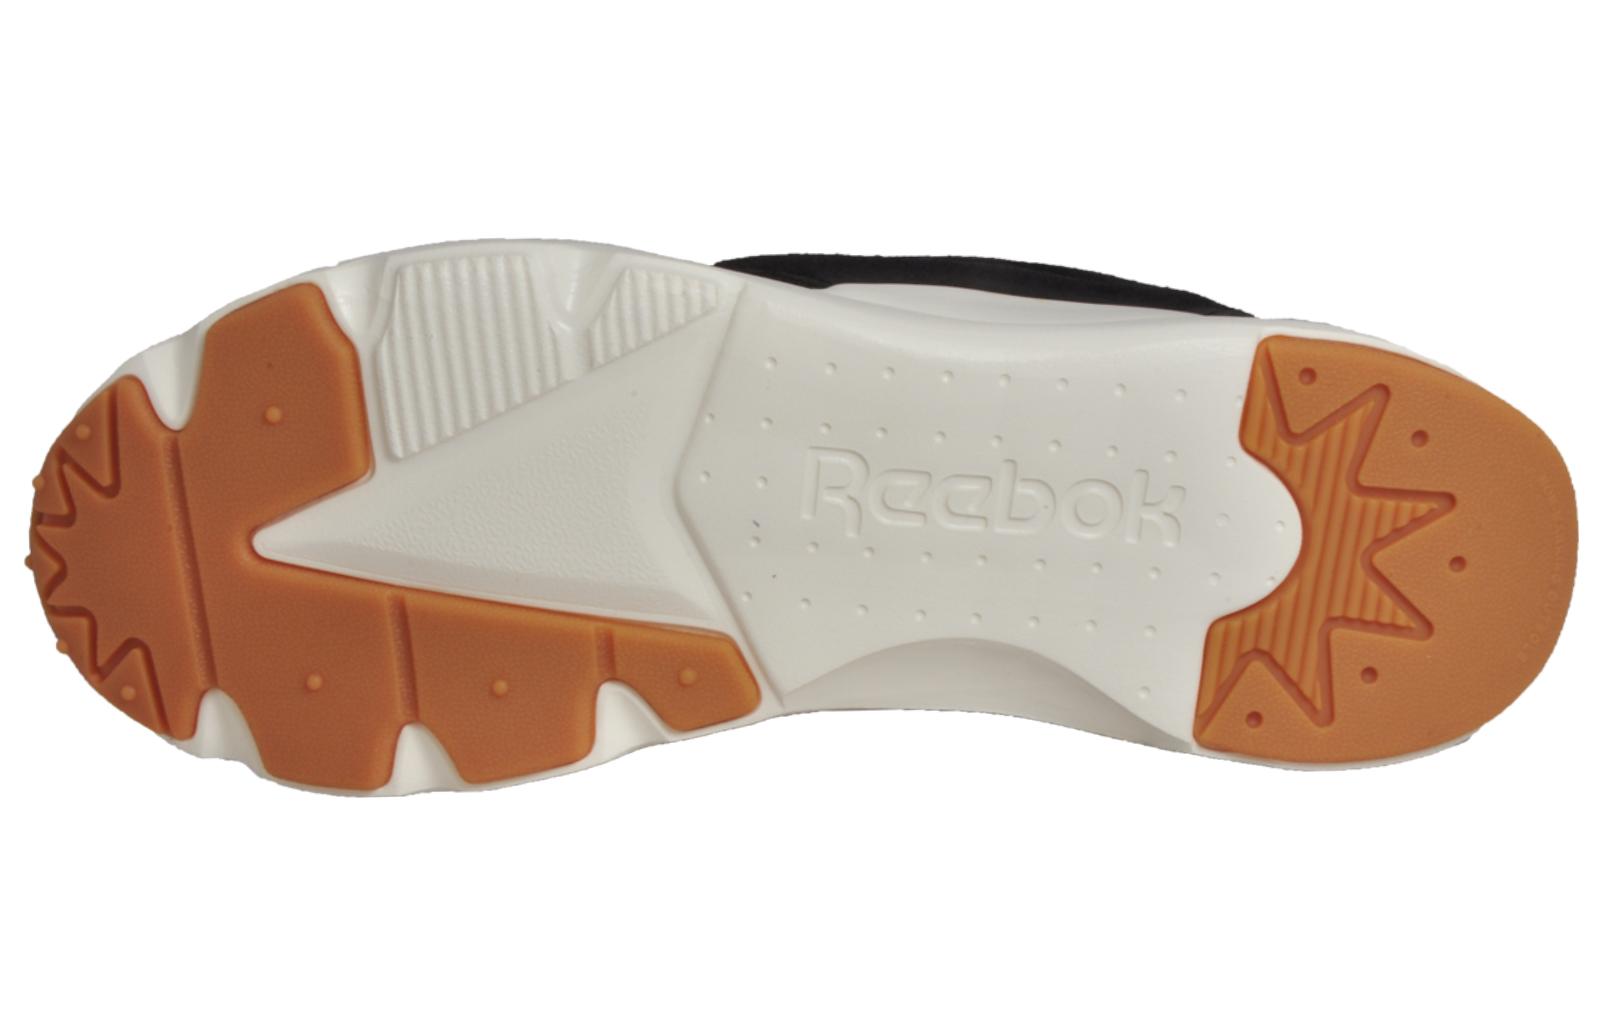 best website 253b1 a430e Reebok Classic Furylite Refine Men s Casual Fashion Retro Fitness Trainers  Black